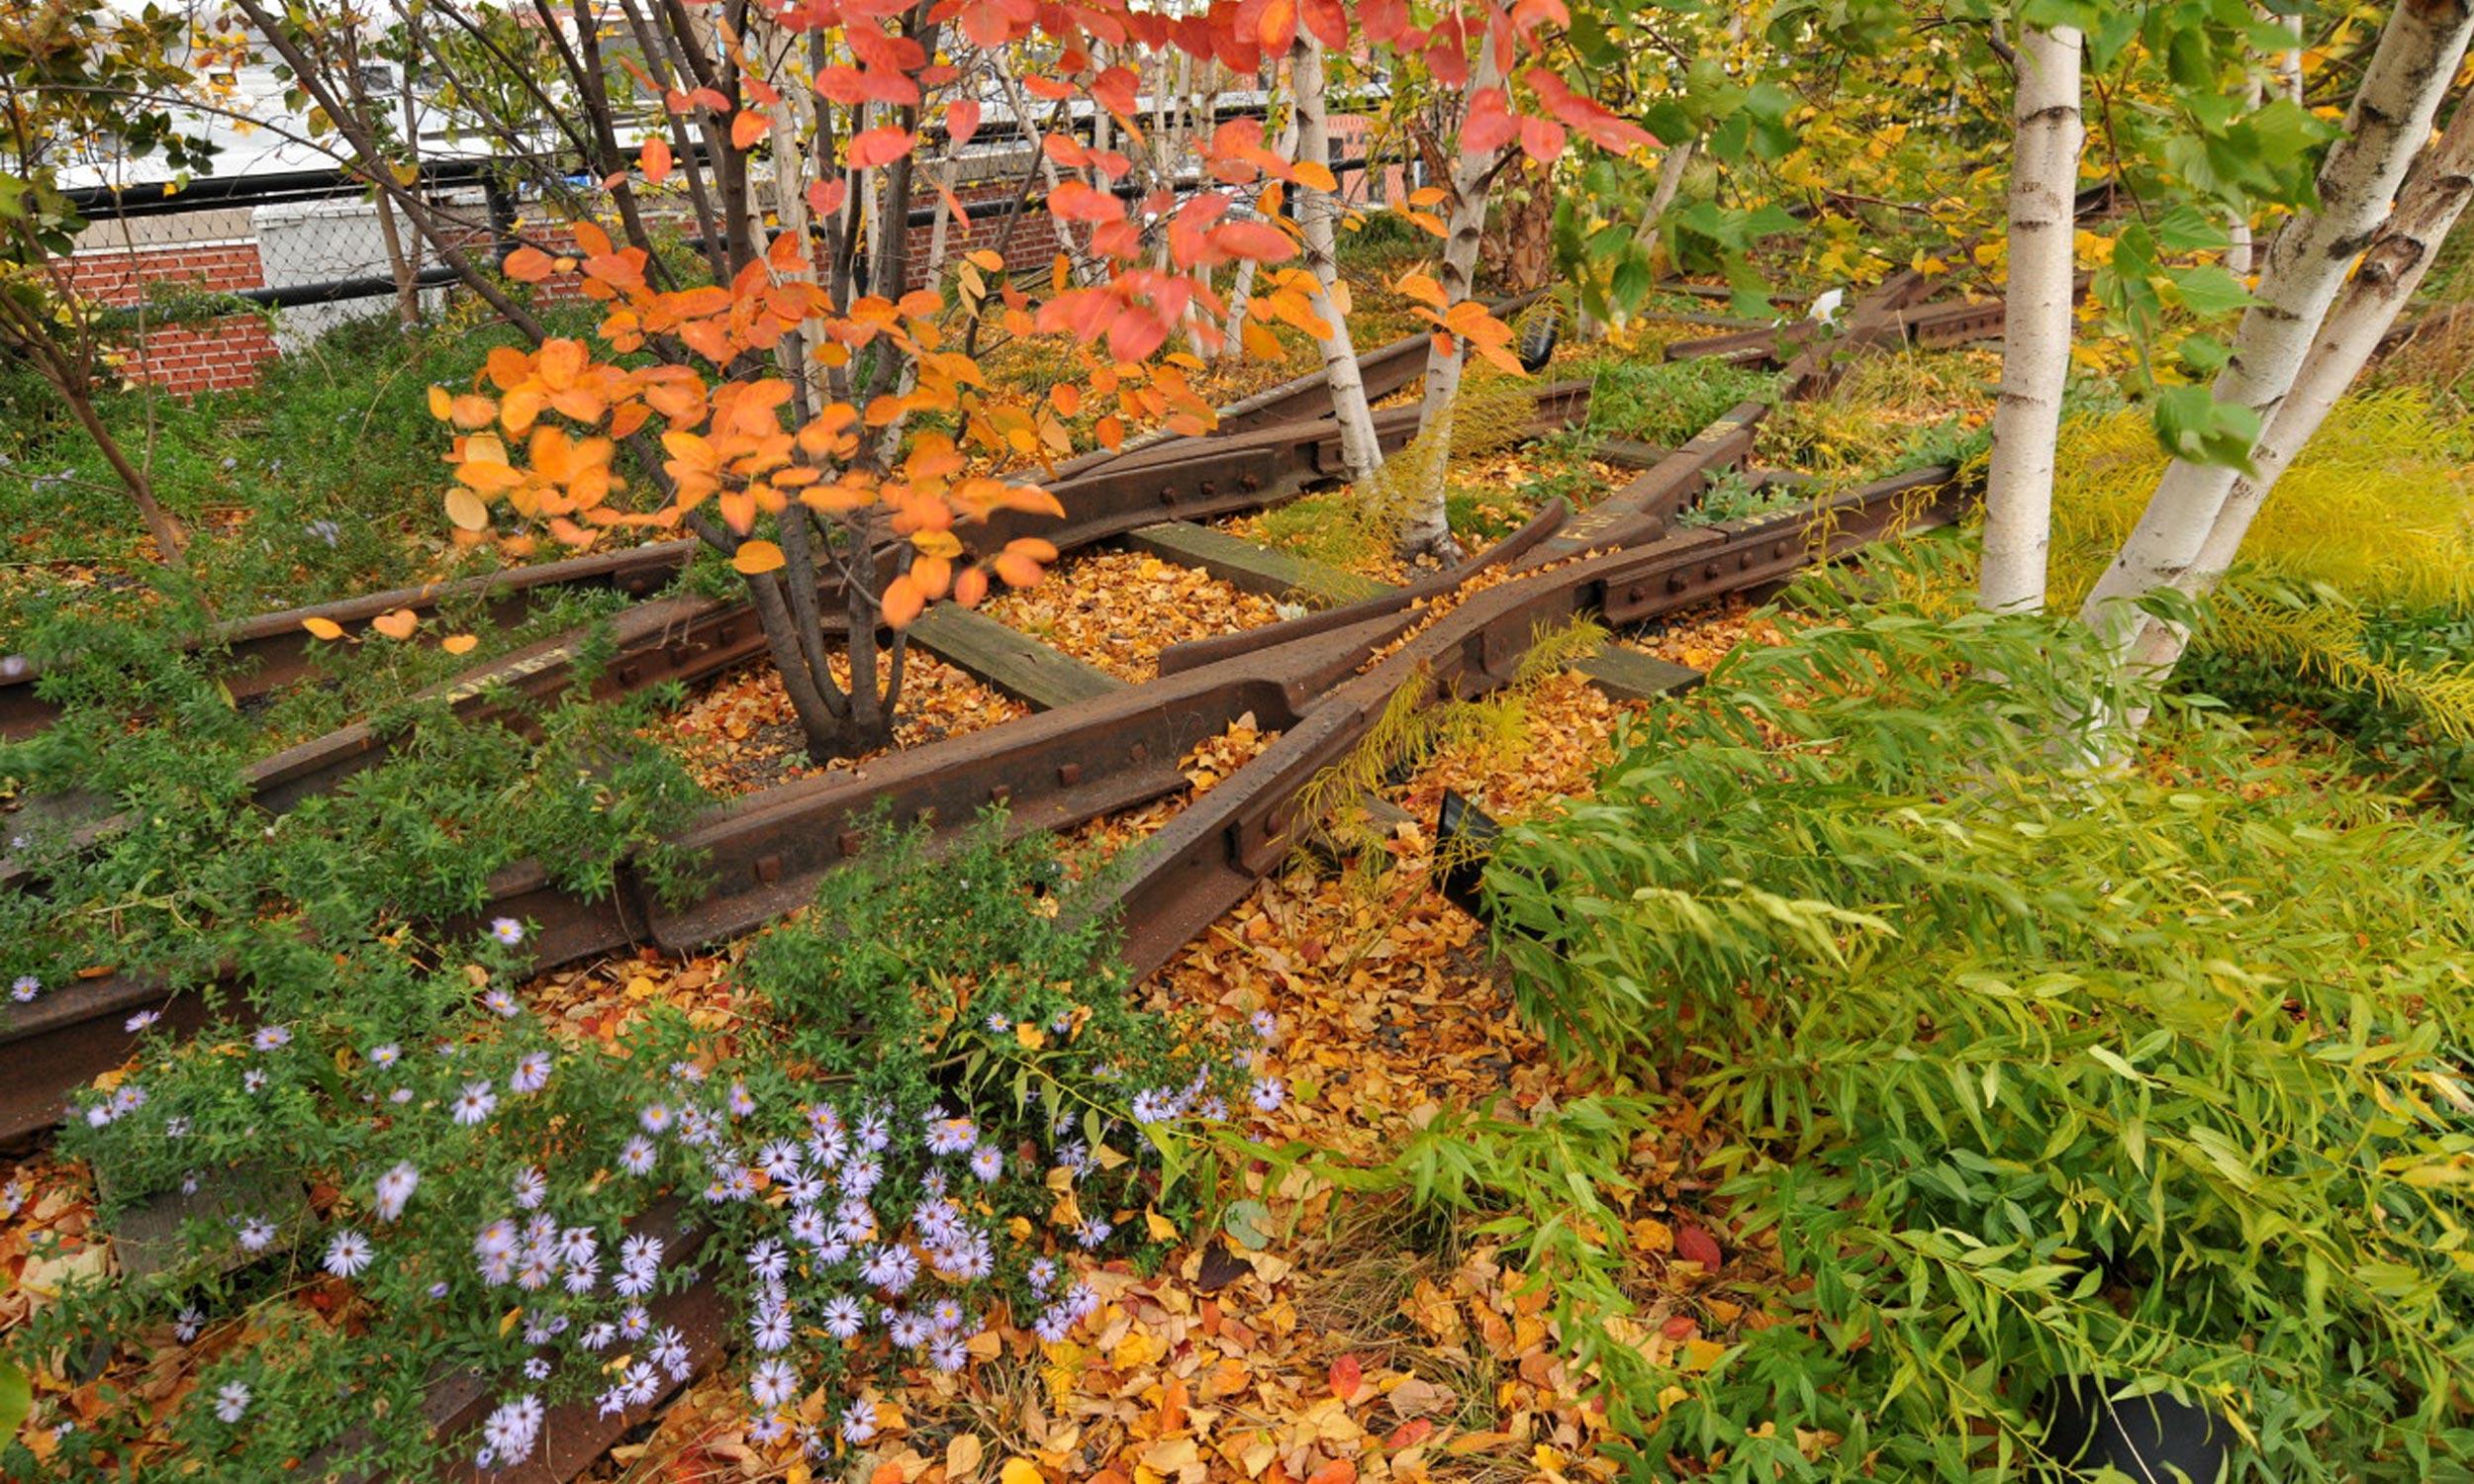 Donald Pels & Wendy Keys Gansevoort Woodland | The High Line